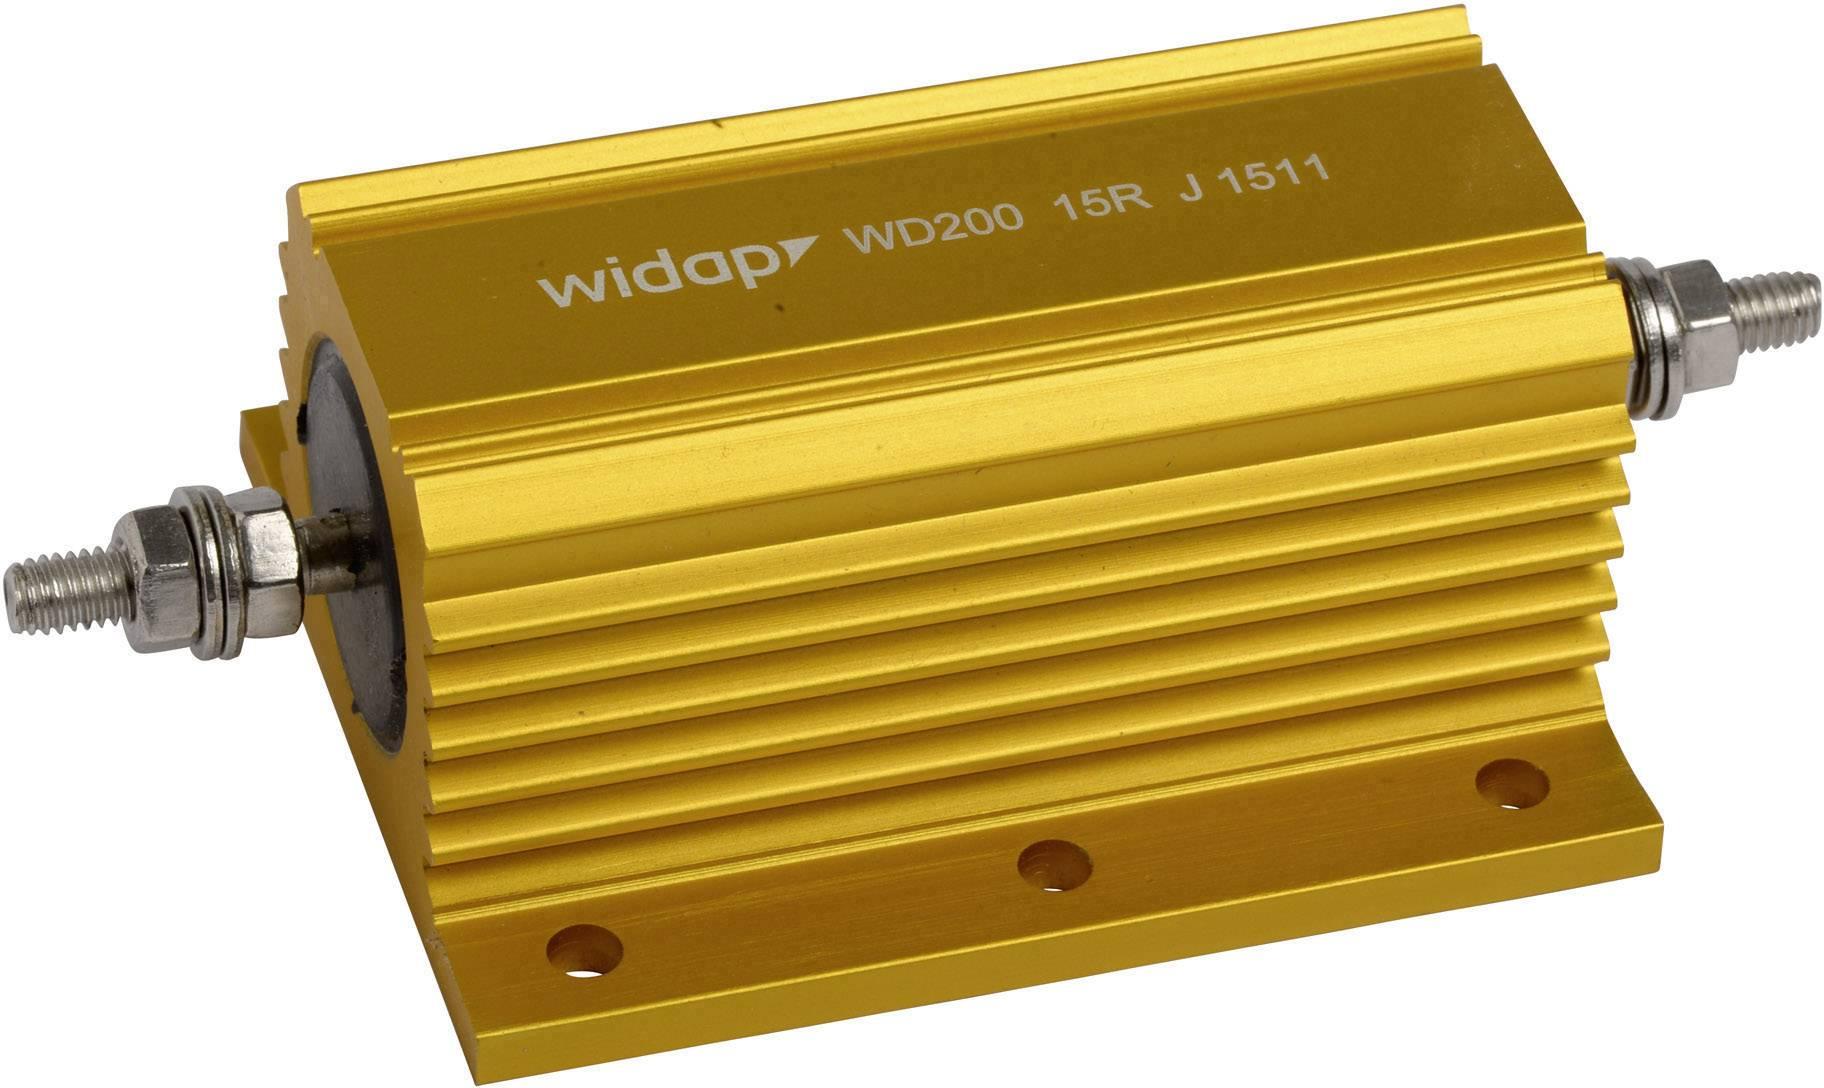 Drôtový rezistor Widap 160148, hodnota odporu 4.7 Ohm, 200 W, 1 ks